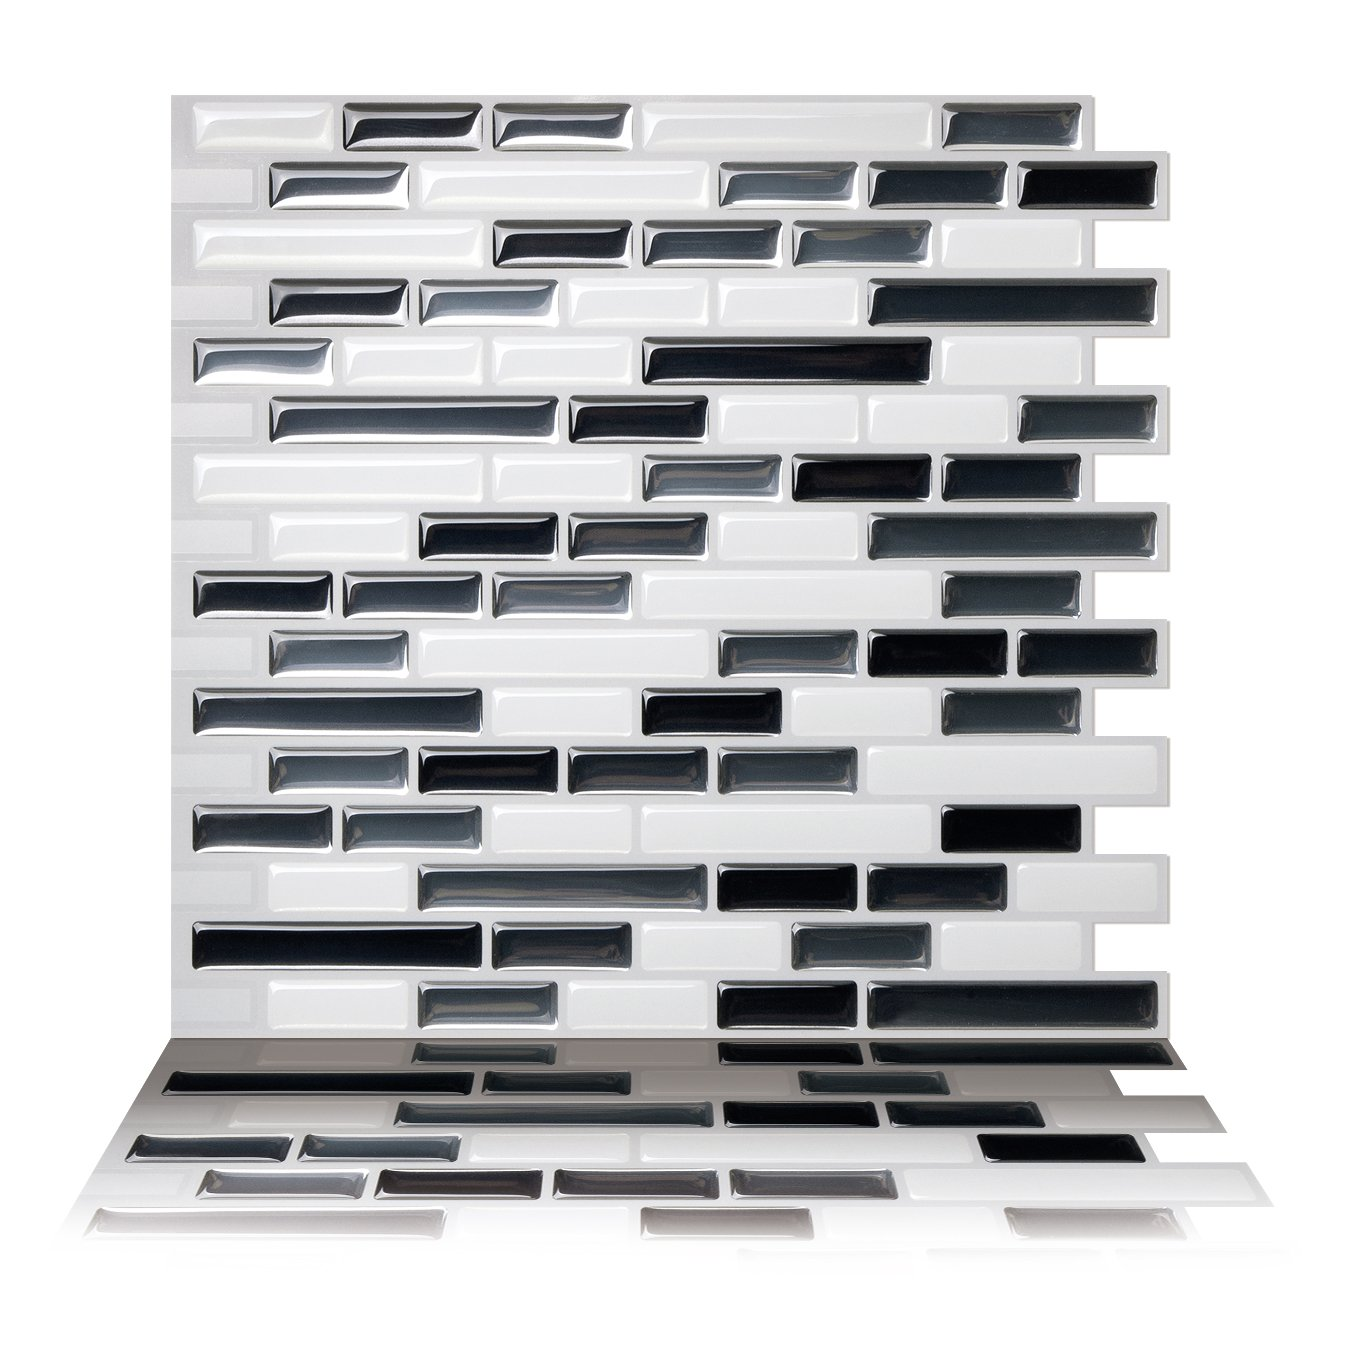 Tic Tac Tiles Premium Anti-mold Peel and Stick Wall Tiles (5 Tiles, Como Gray)